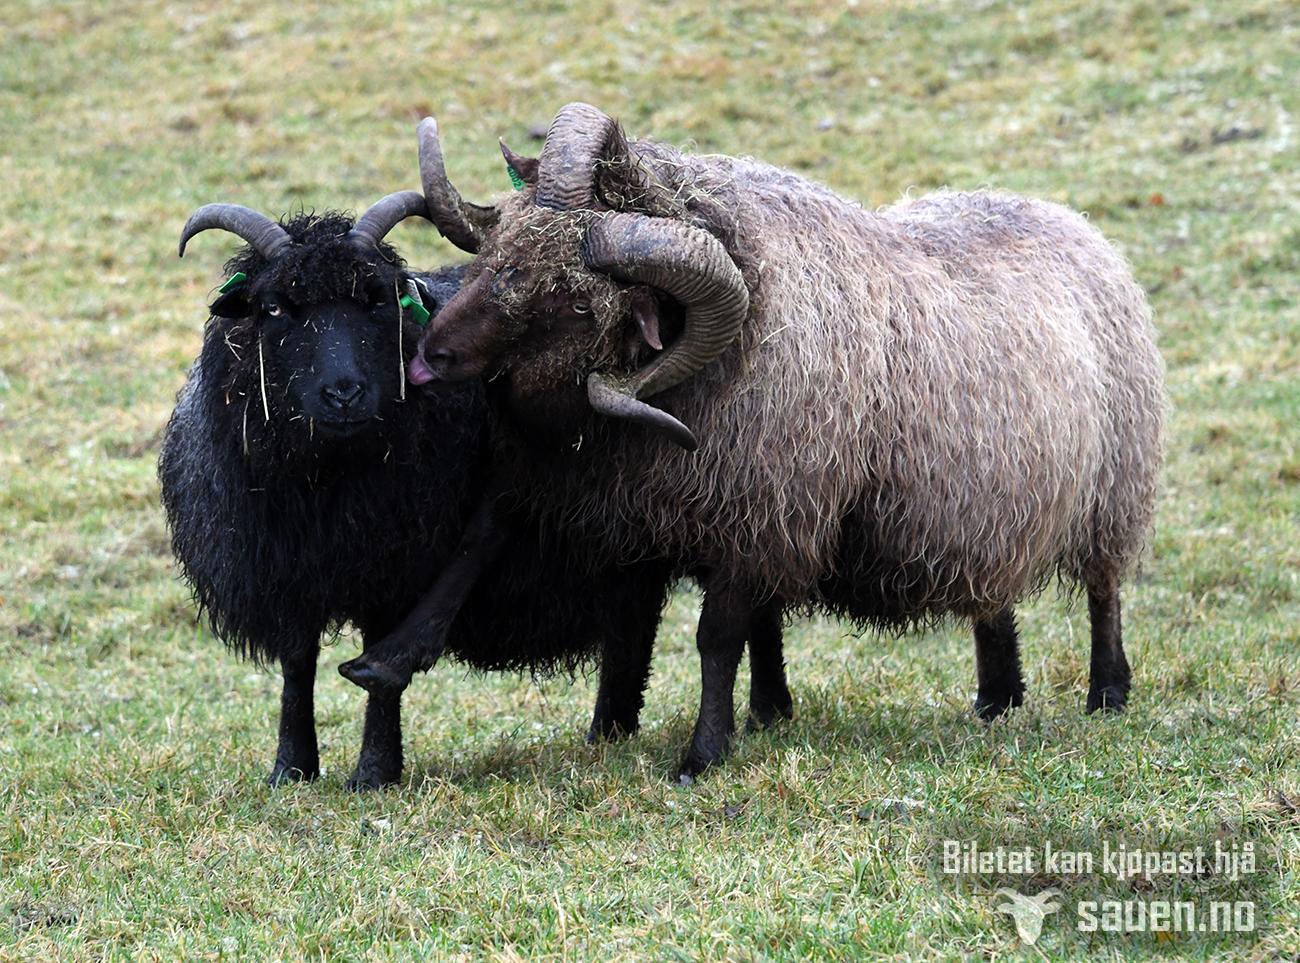 sau, sheep, gammalnorsk spælsau, bilde av sau, foto